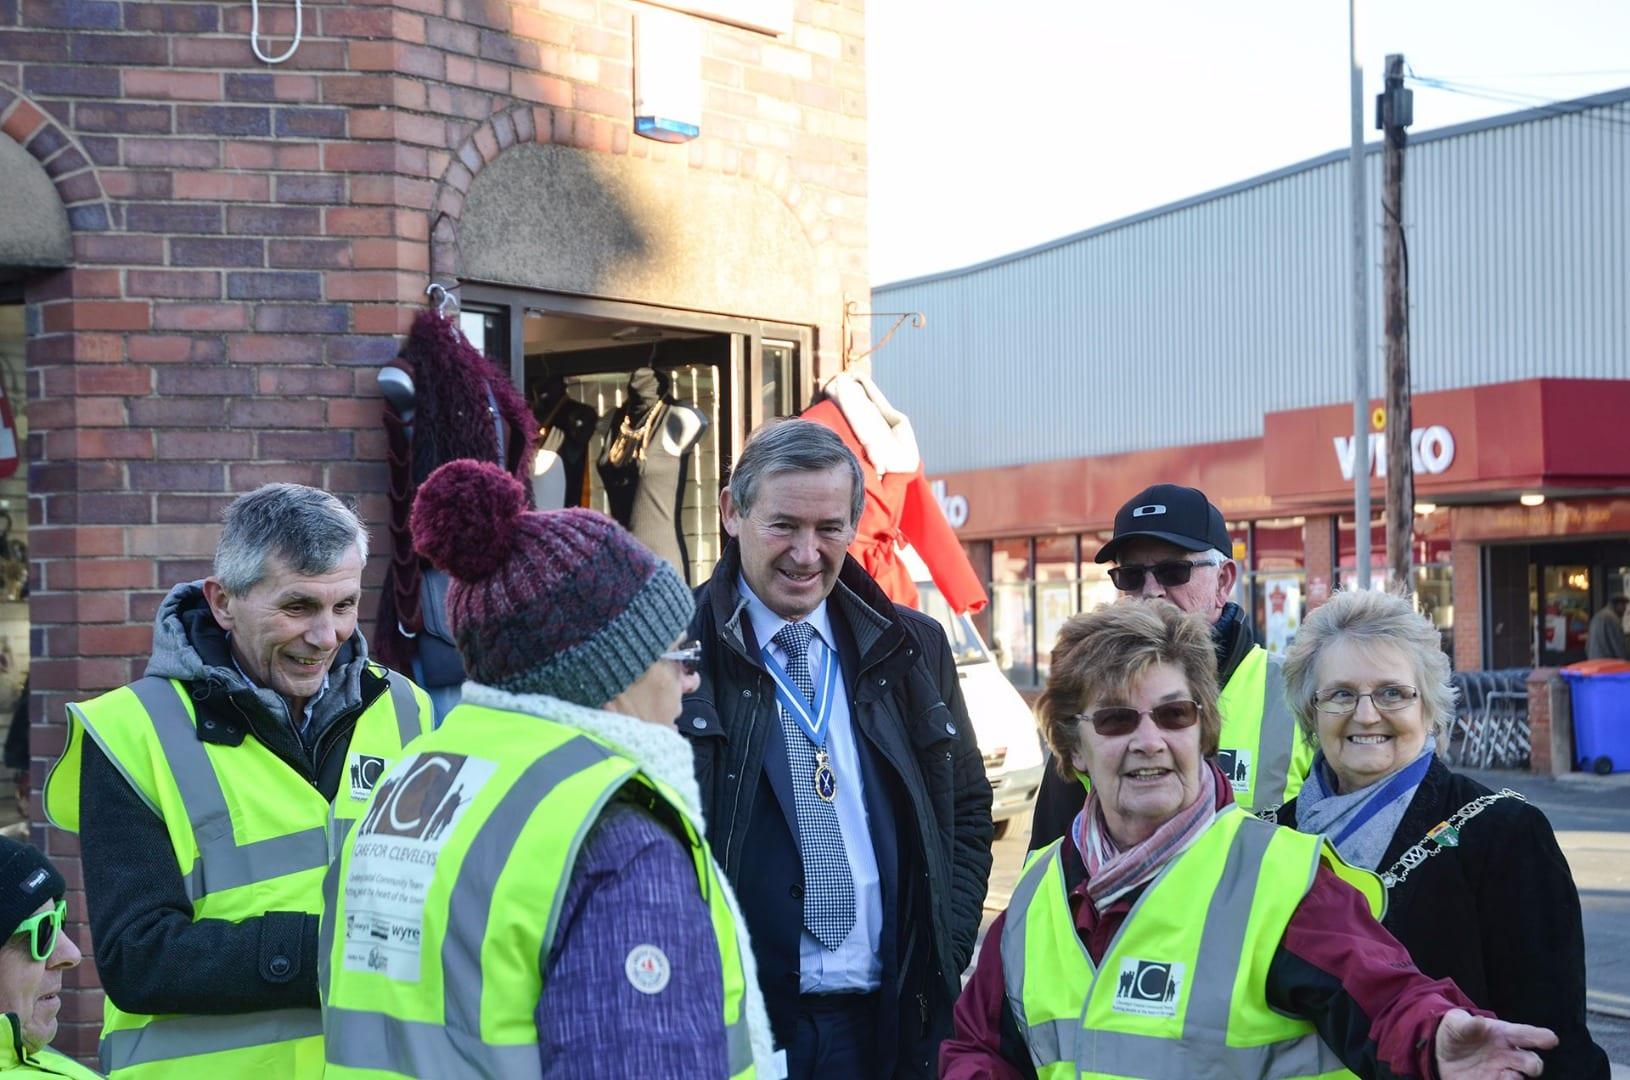 High Sherriff visits Cleveleys Coastal Community Team. Cleveleys Coastal Community Team updates